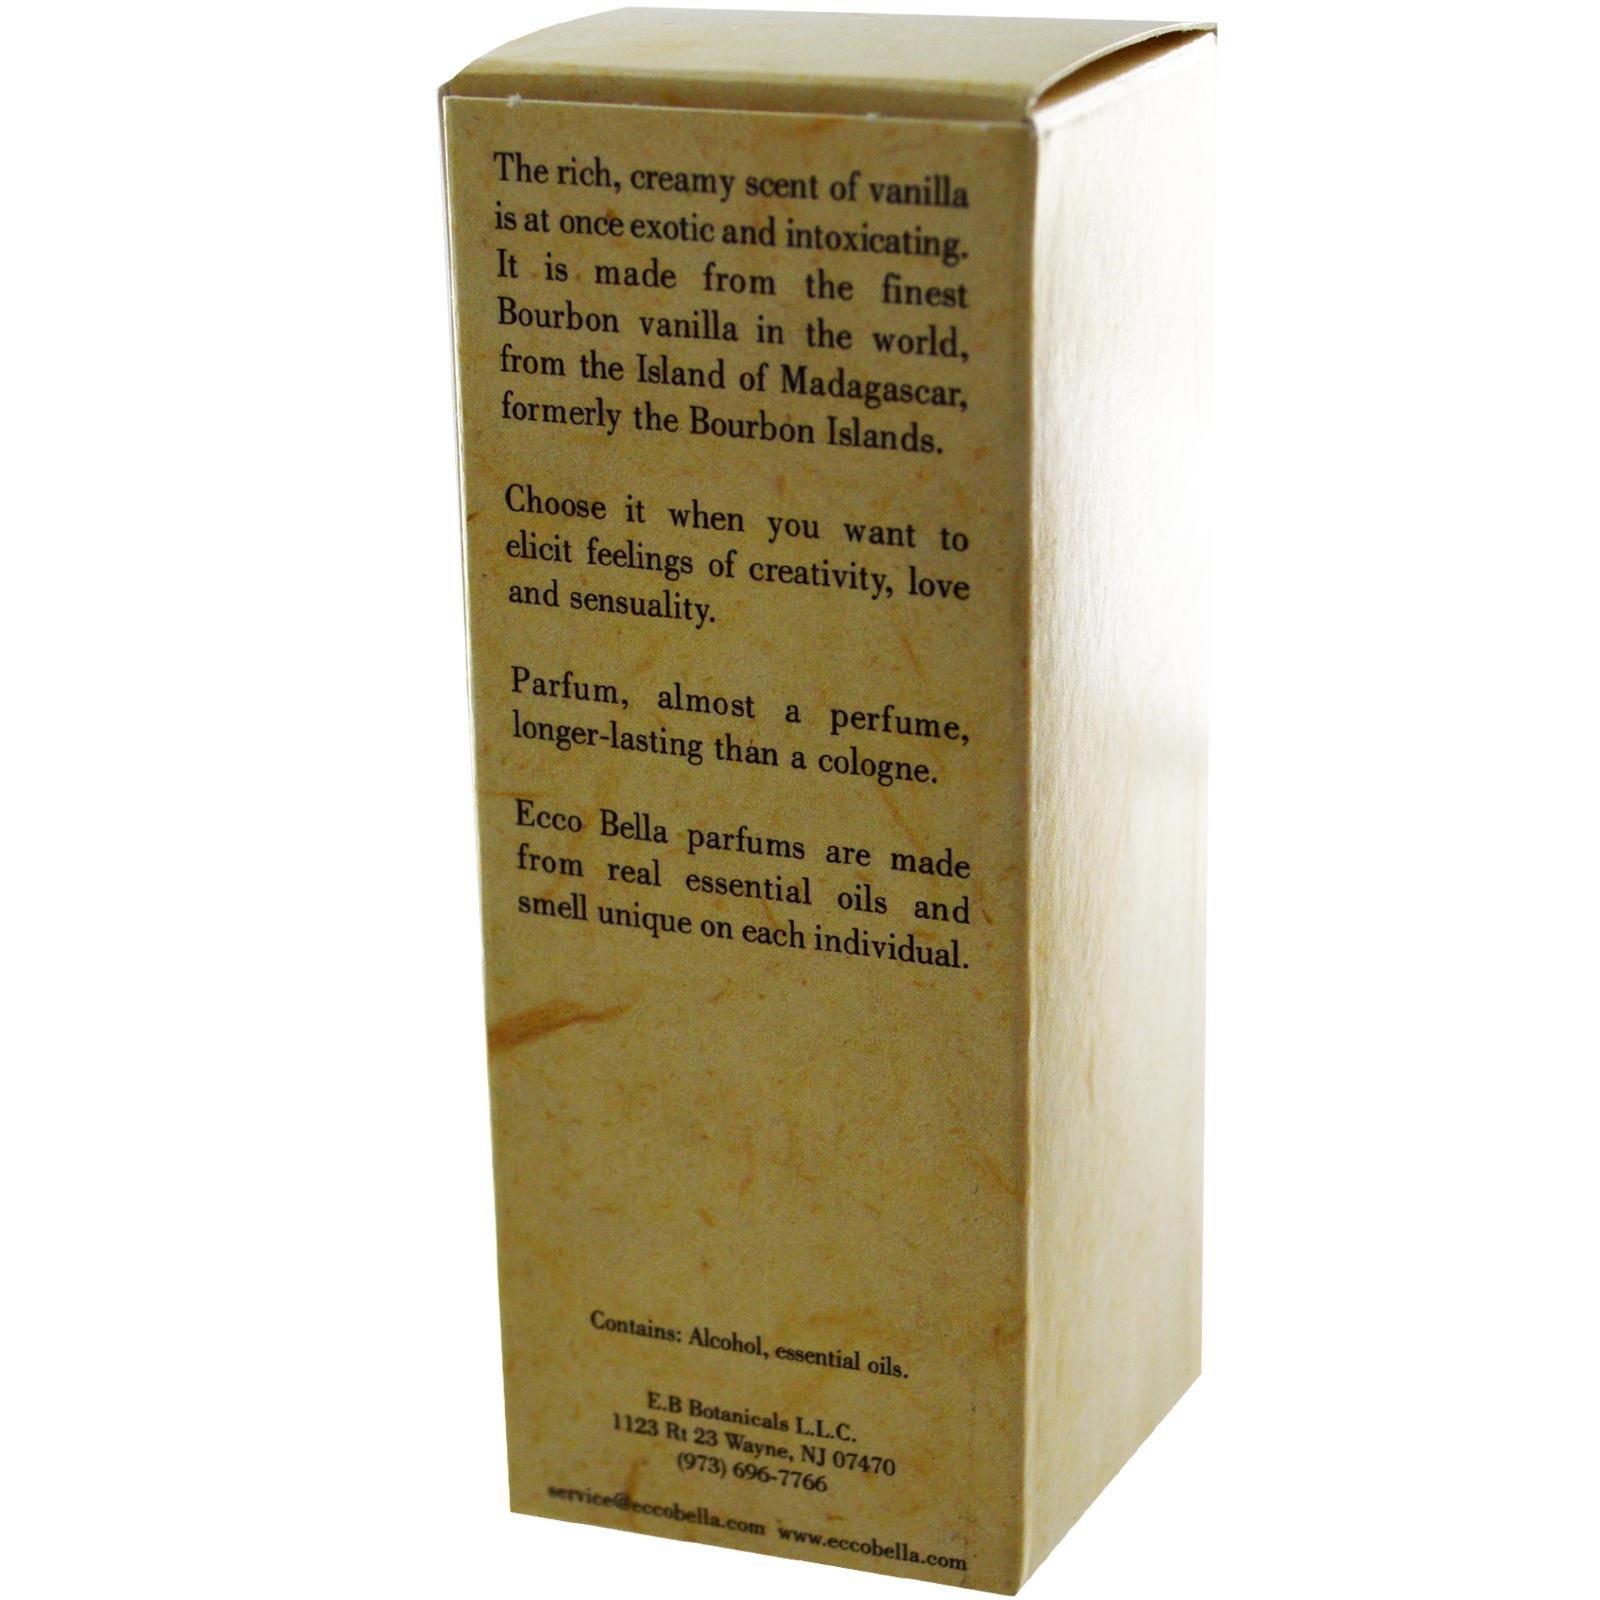 Ecco Bella, Bourbon Vanilla, Spray, 1 fl oz (30 ml) - iHerb.com